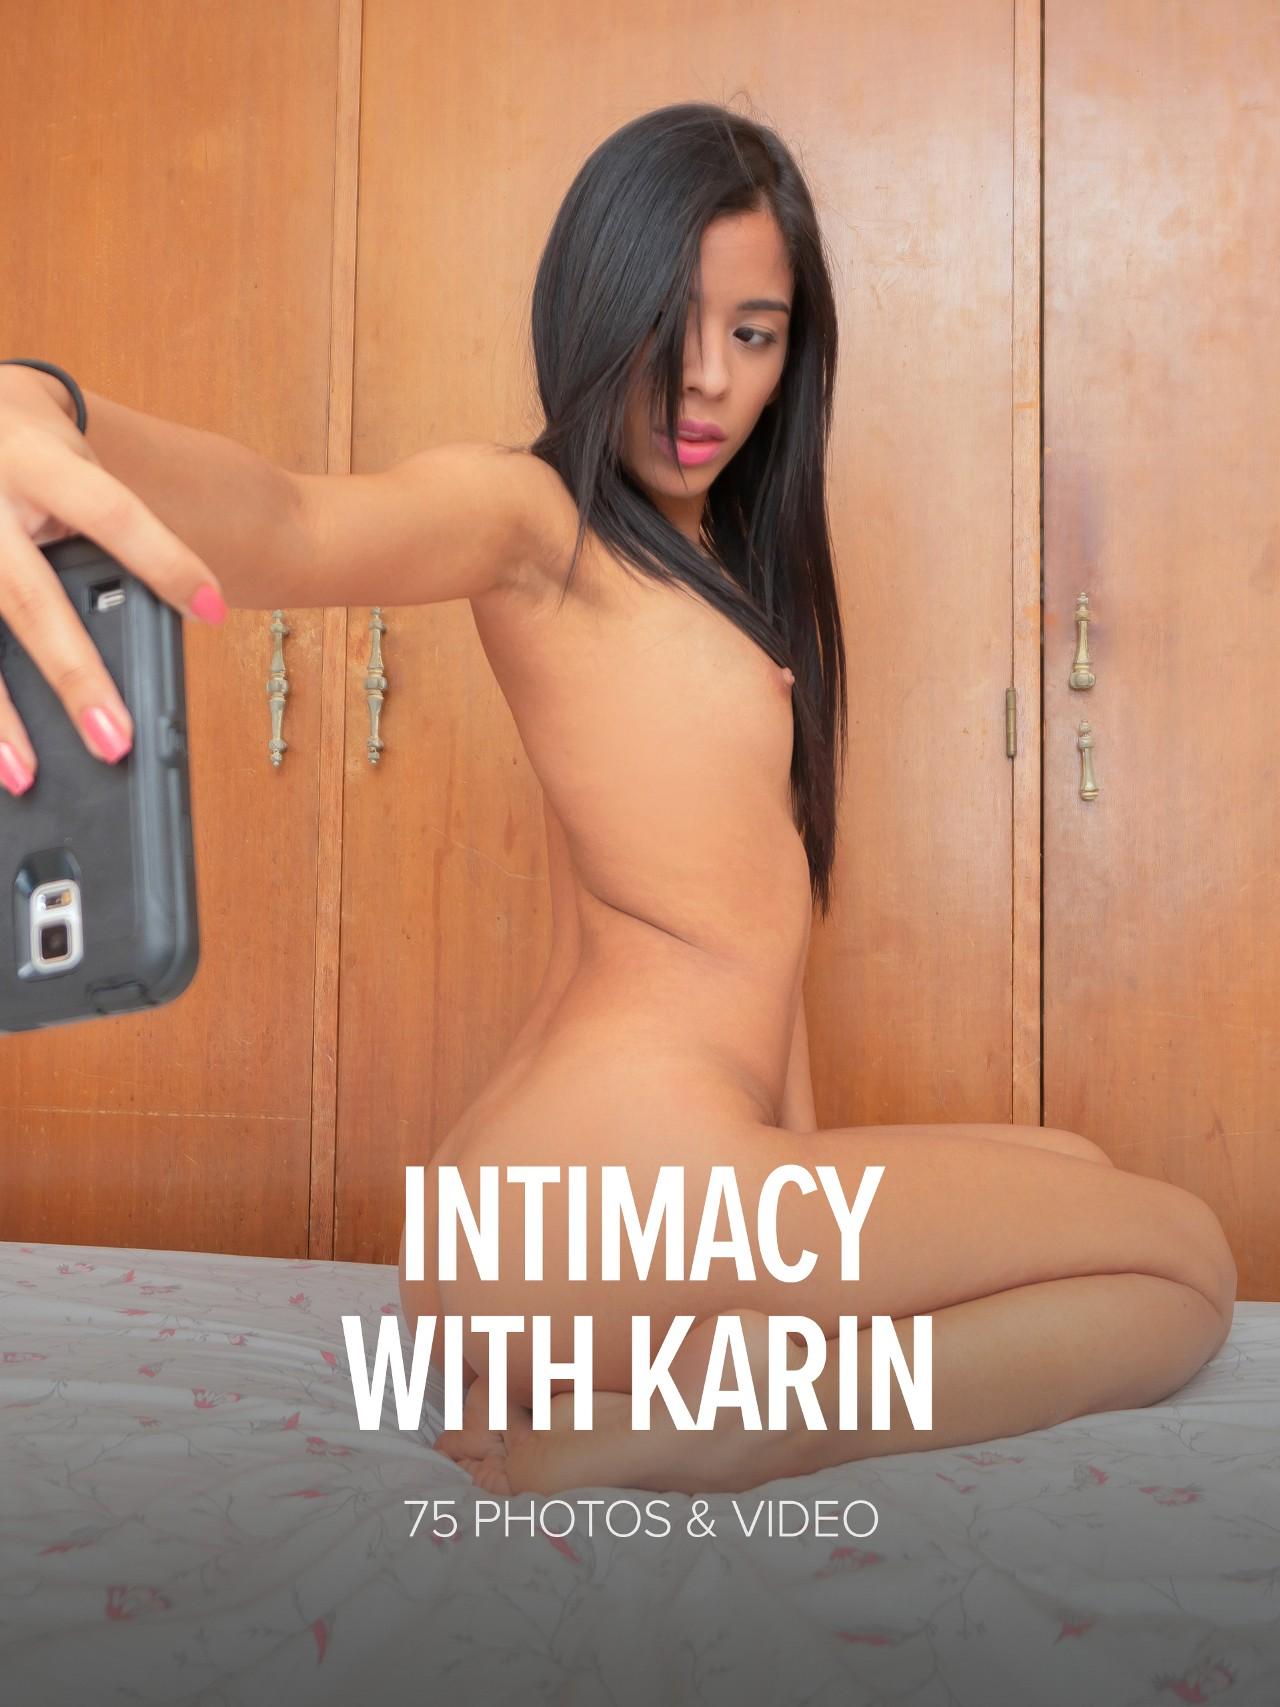 Karin Torres: Intimacy With Karin